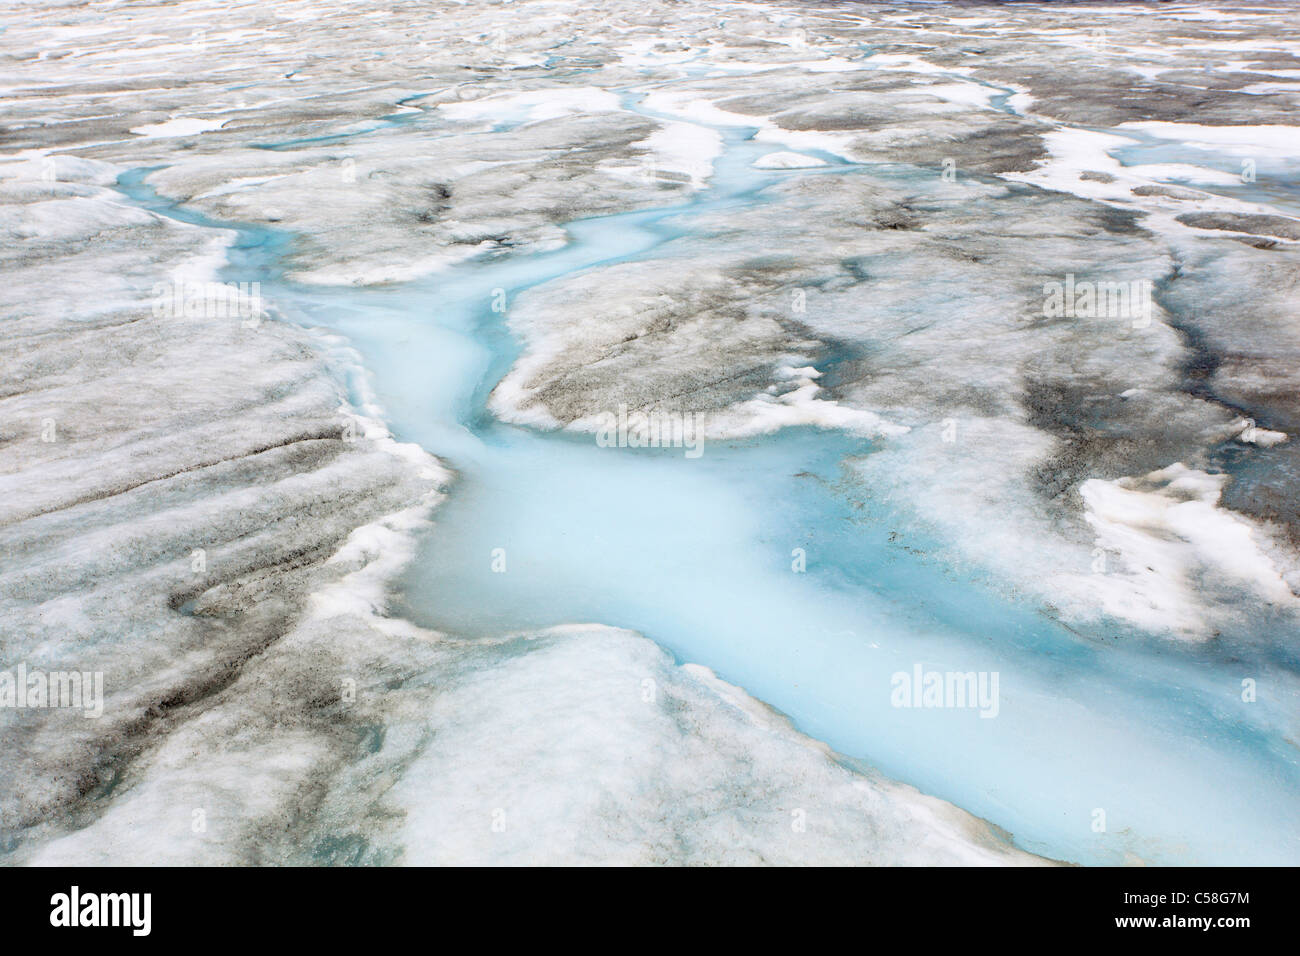 Alps, panorama, mountains, detail, ice, ice melting, Furka, Pass, Furka Pass, mountains, glacier, clima, glacier - Stock Image